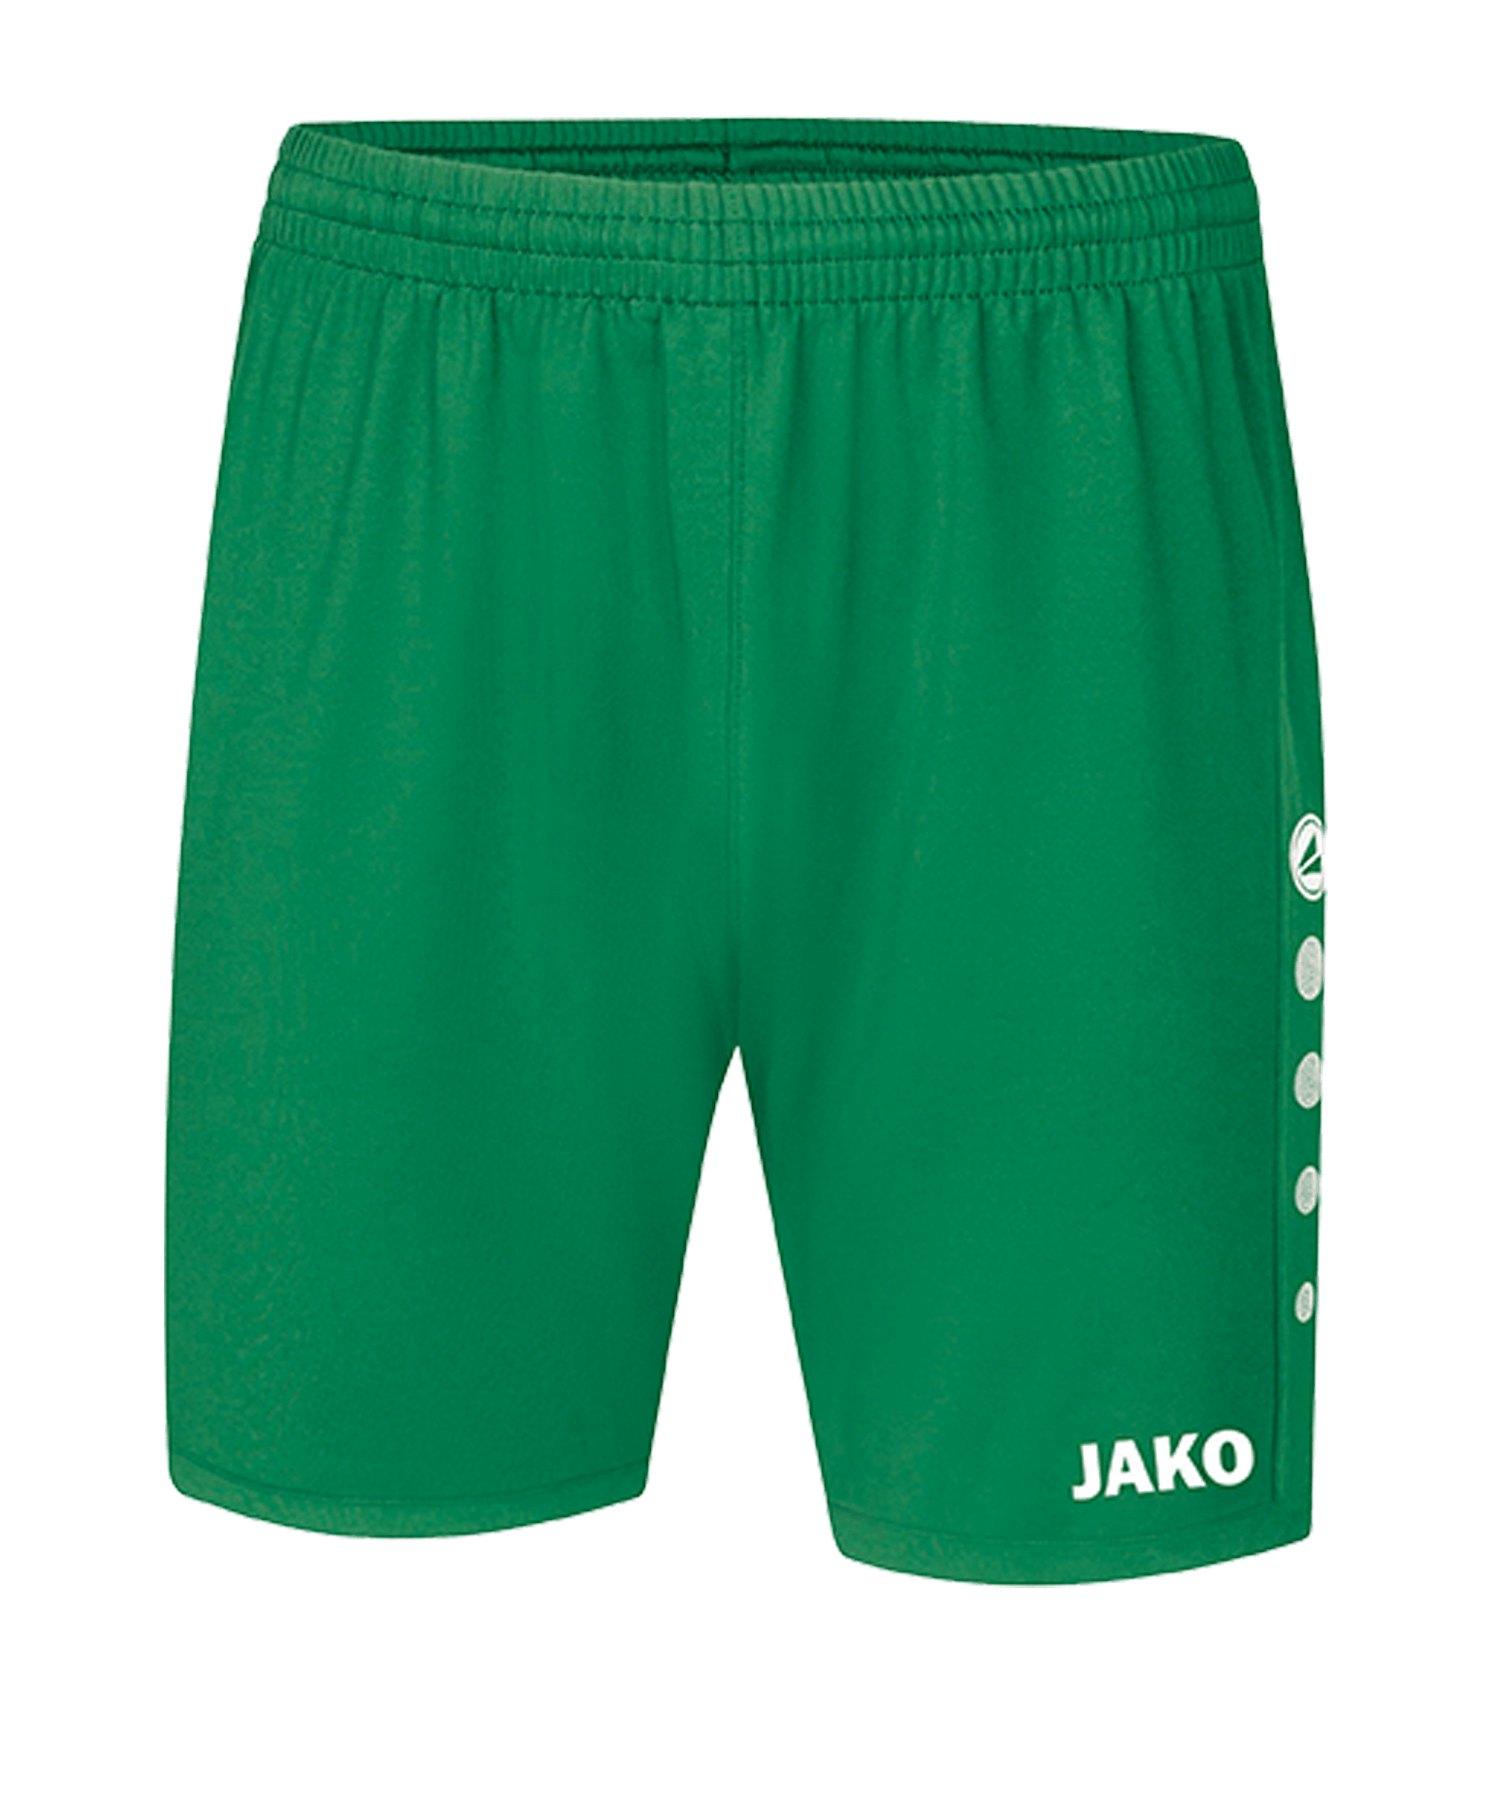 JAKO Premium Short Grün F06 - Gruen